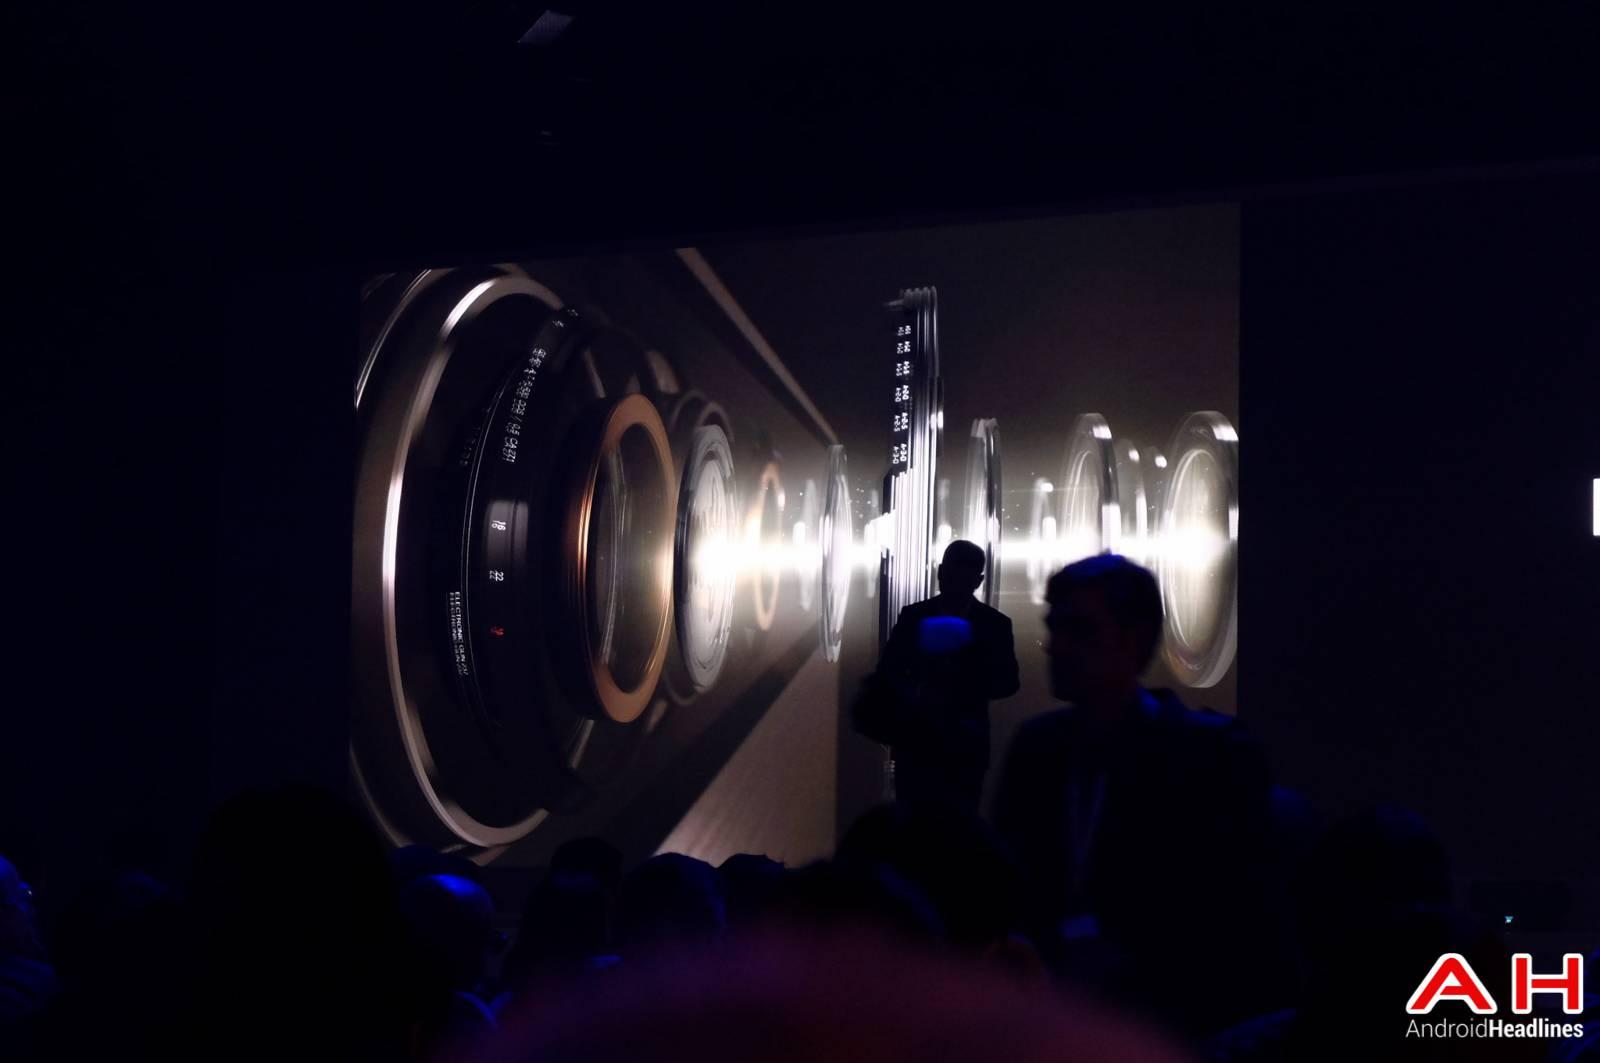 Huawei P9 Event 6 AH 0387